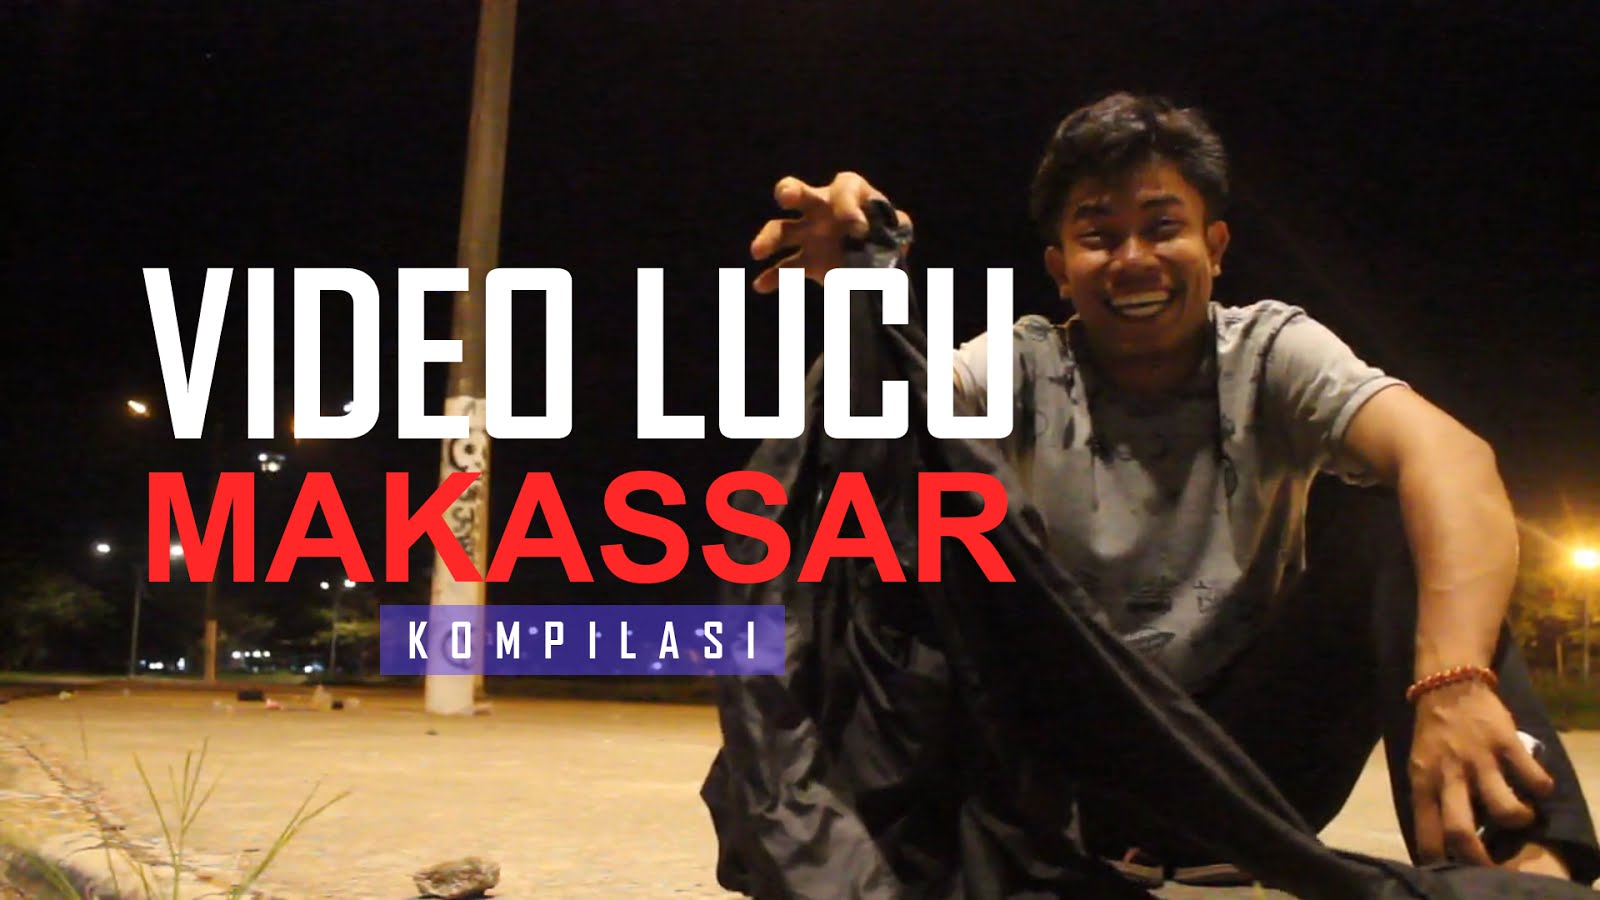 Film Pendek Makassar Terbaru Youtube 21 Petang Berdarah